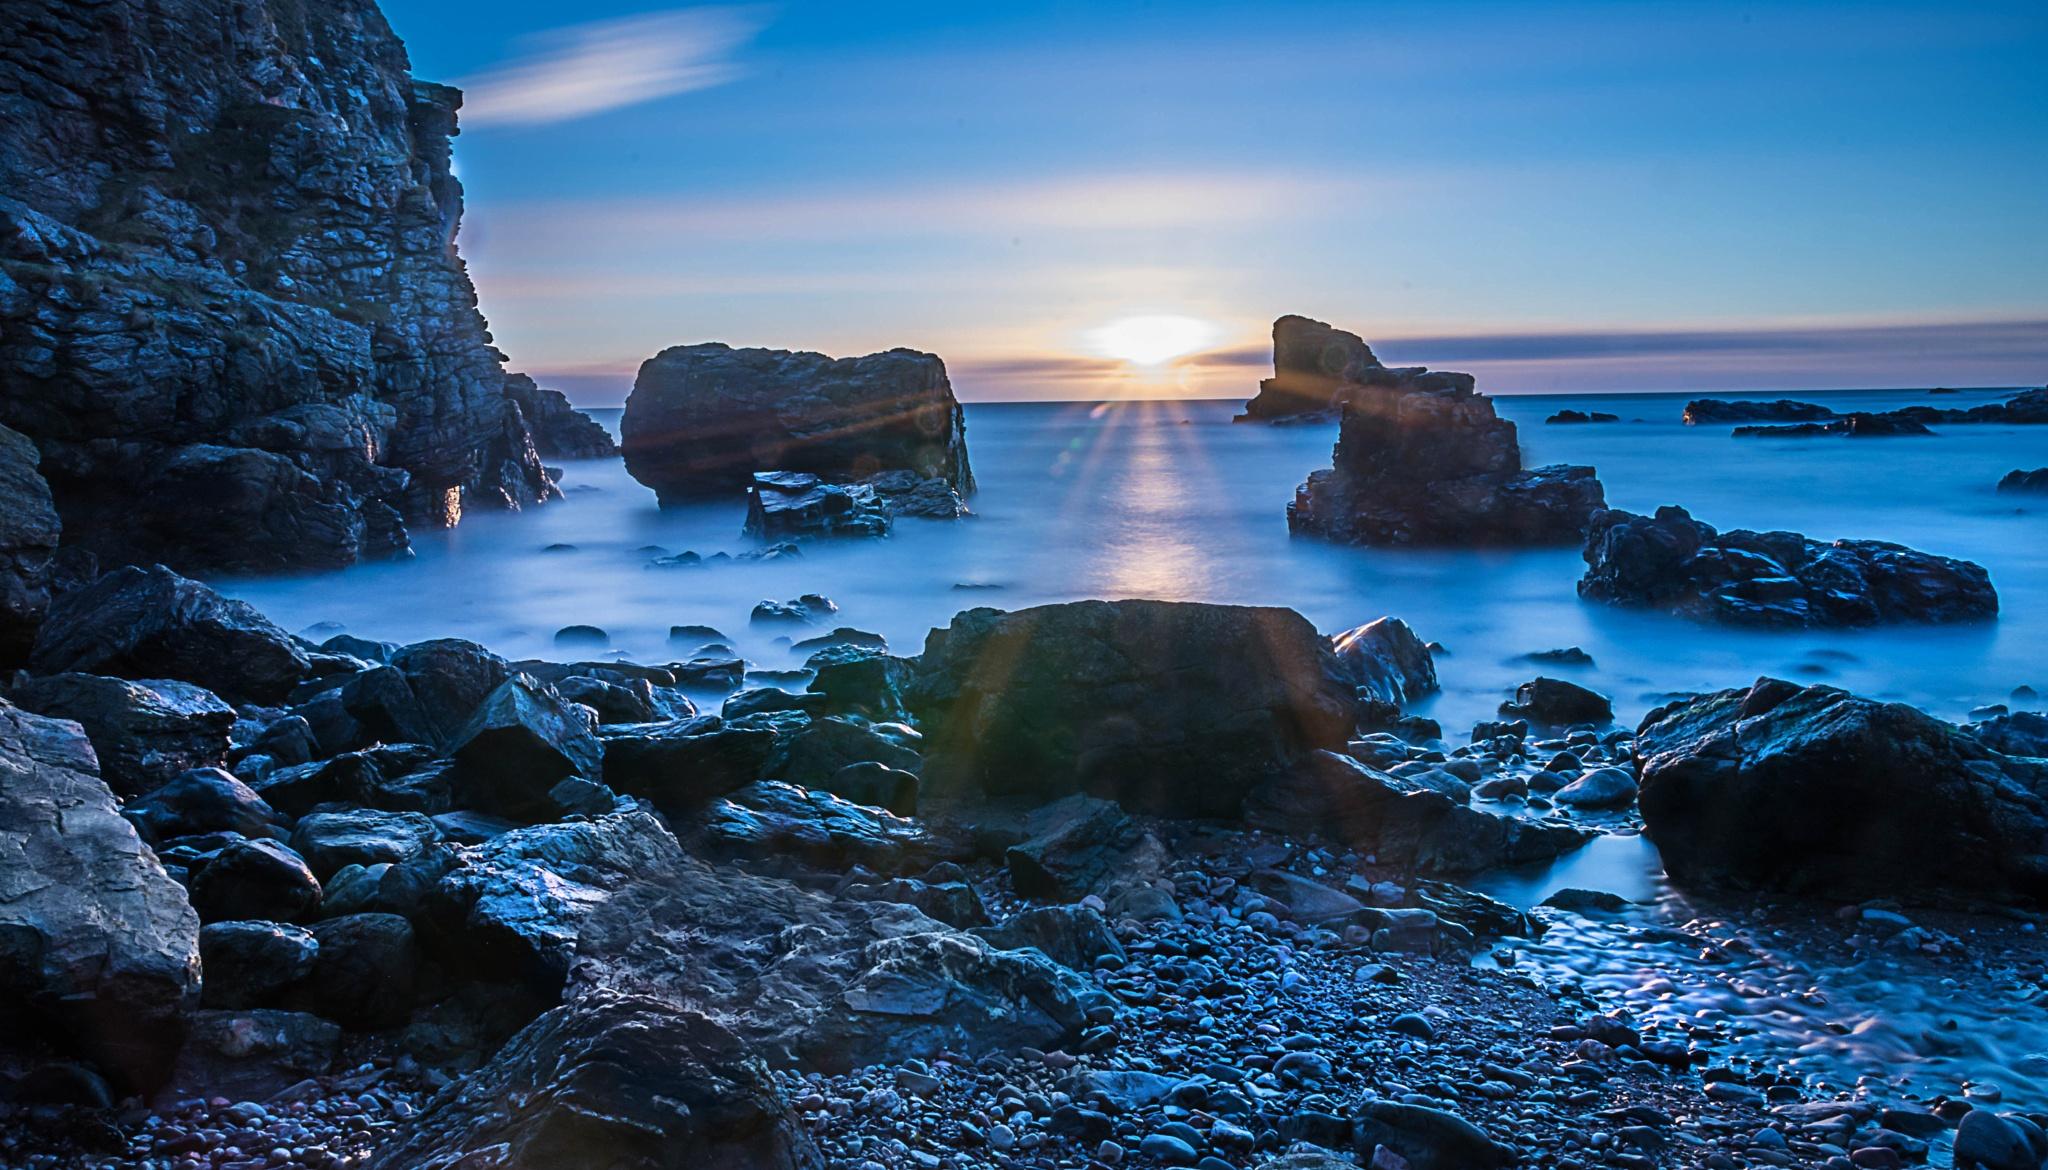 Muchalls Morning by Andrew Dalgarno